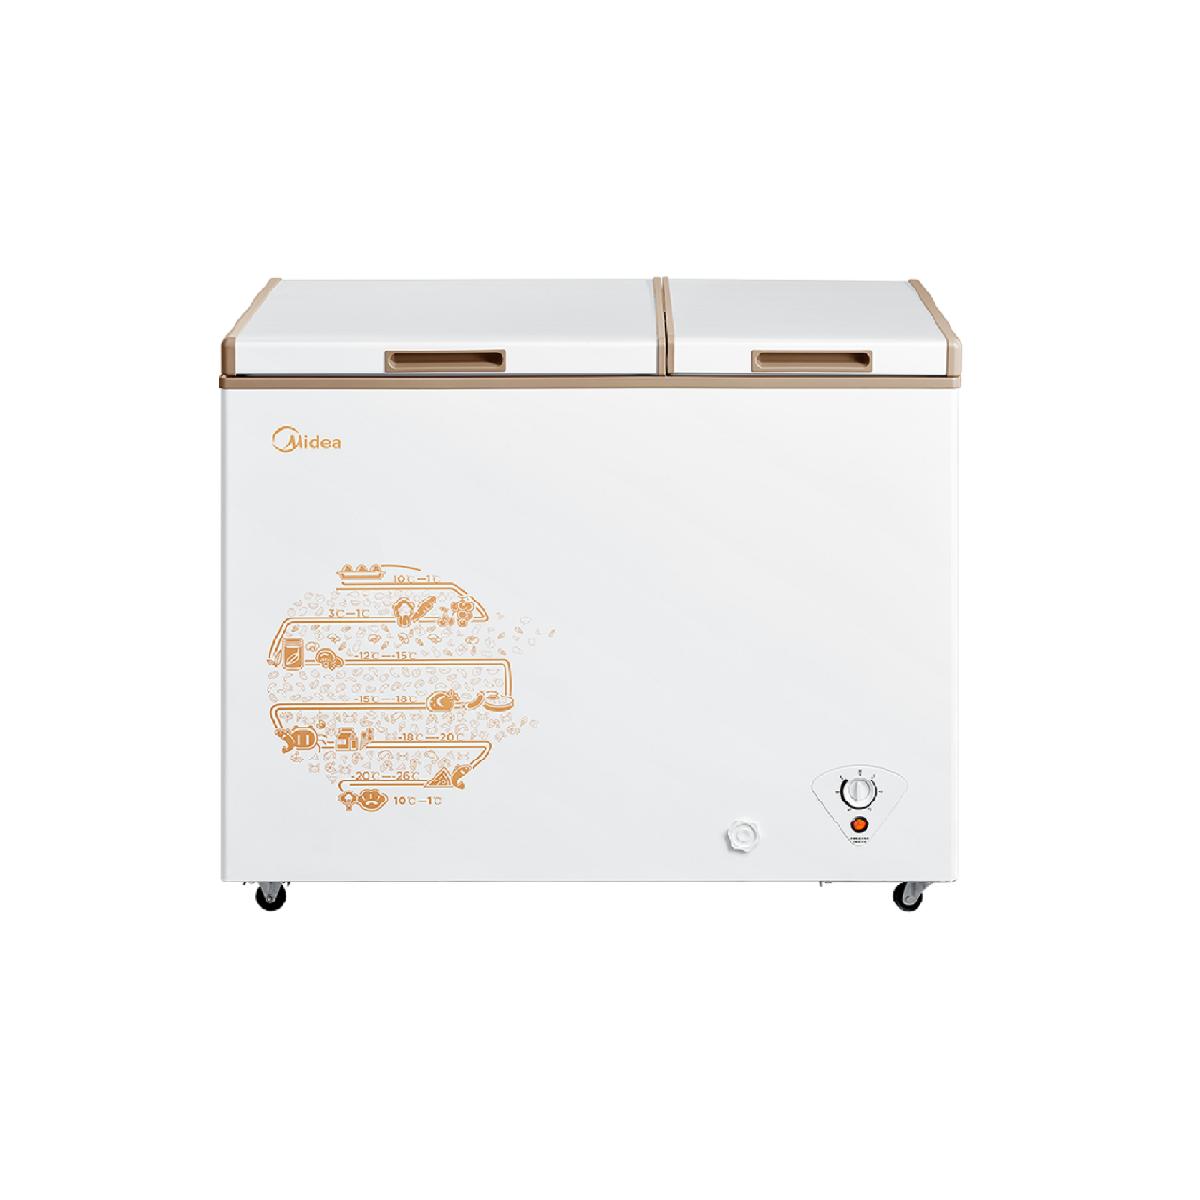 Midea/美的 BCD-182DKMB冷柜 说明书.pdf